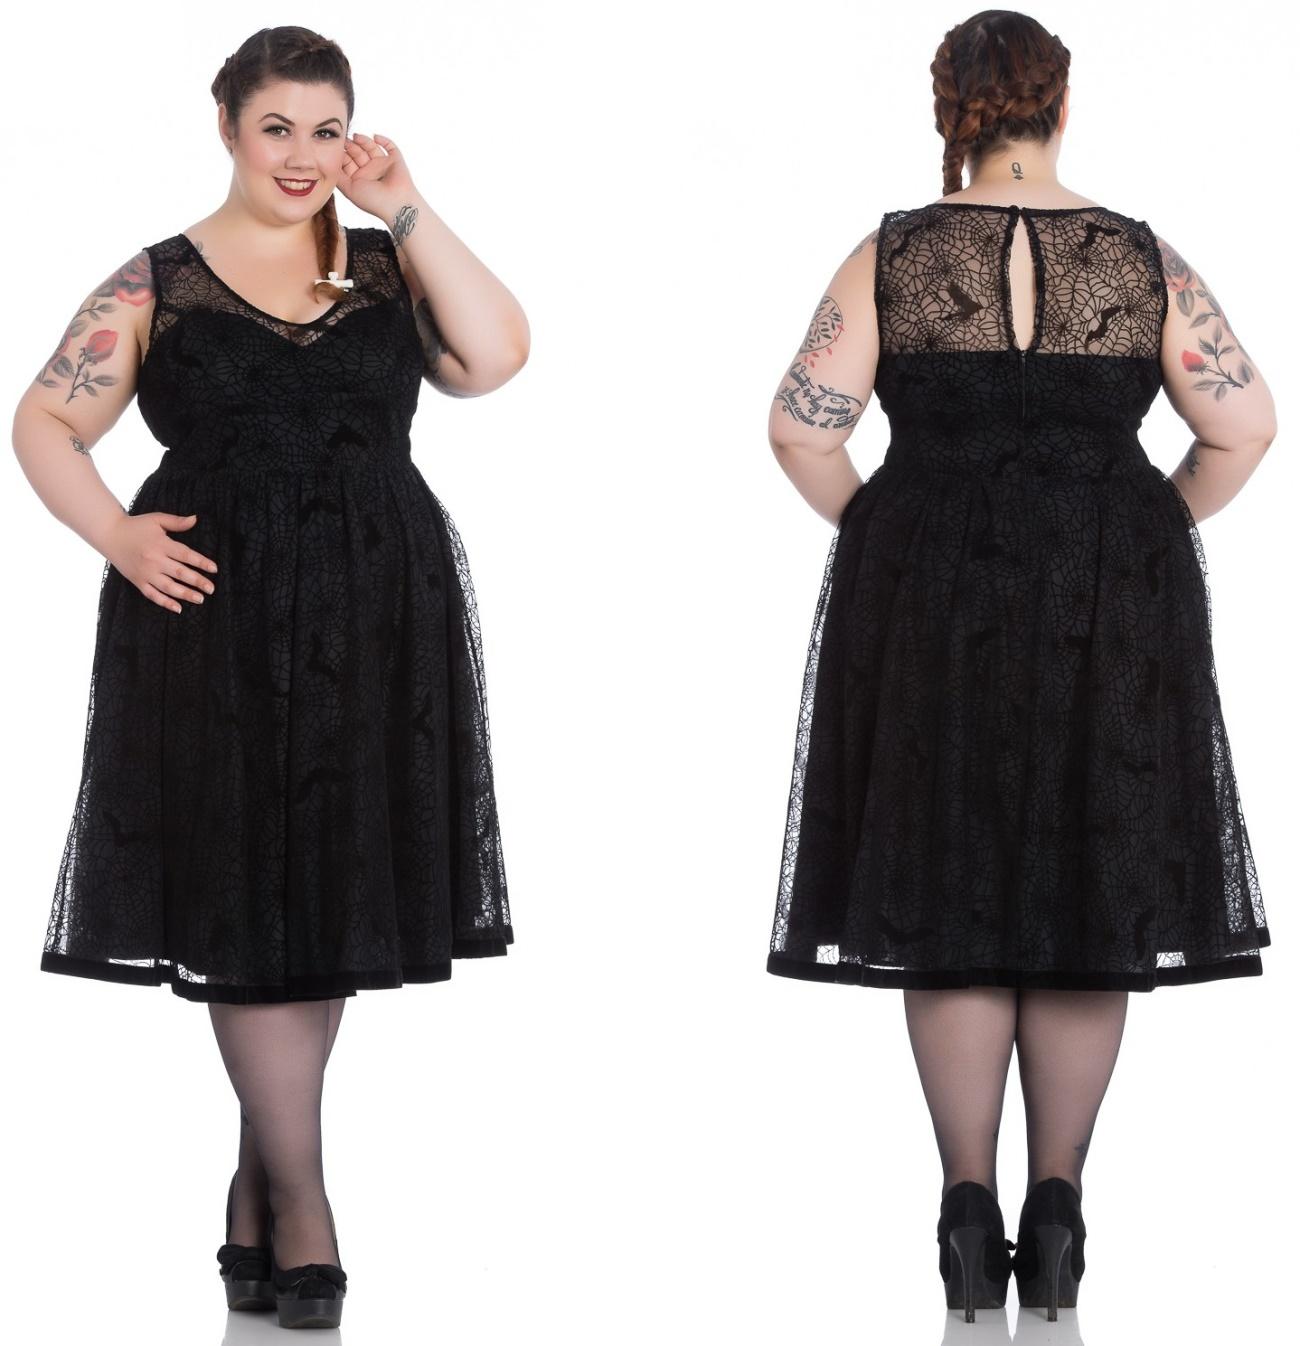 amarande dress kleid spinnennetz plussize hellbunny. Black Bedroom Furniture Sets. Home Design Ideas